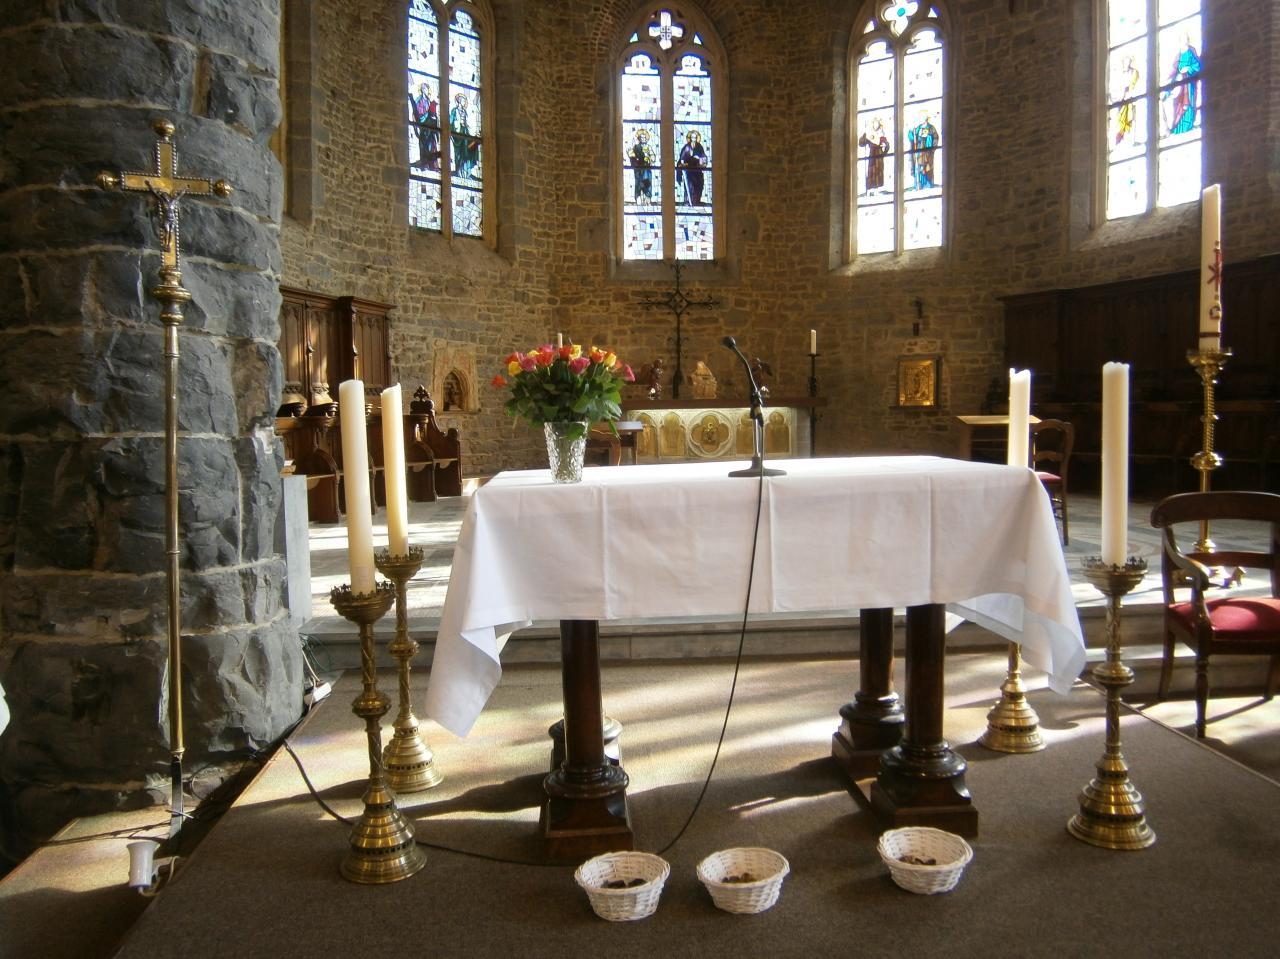 Eglise St-Servais